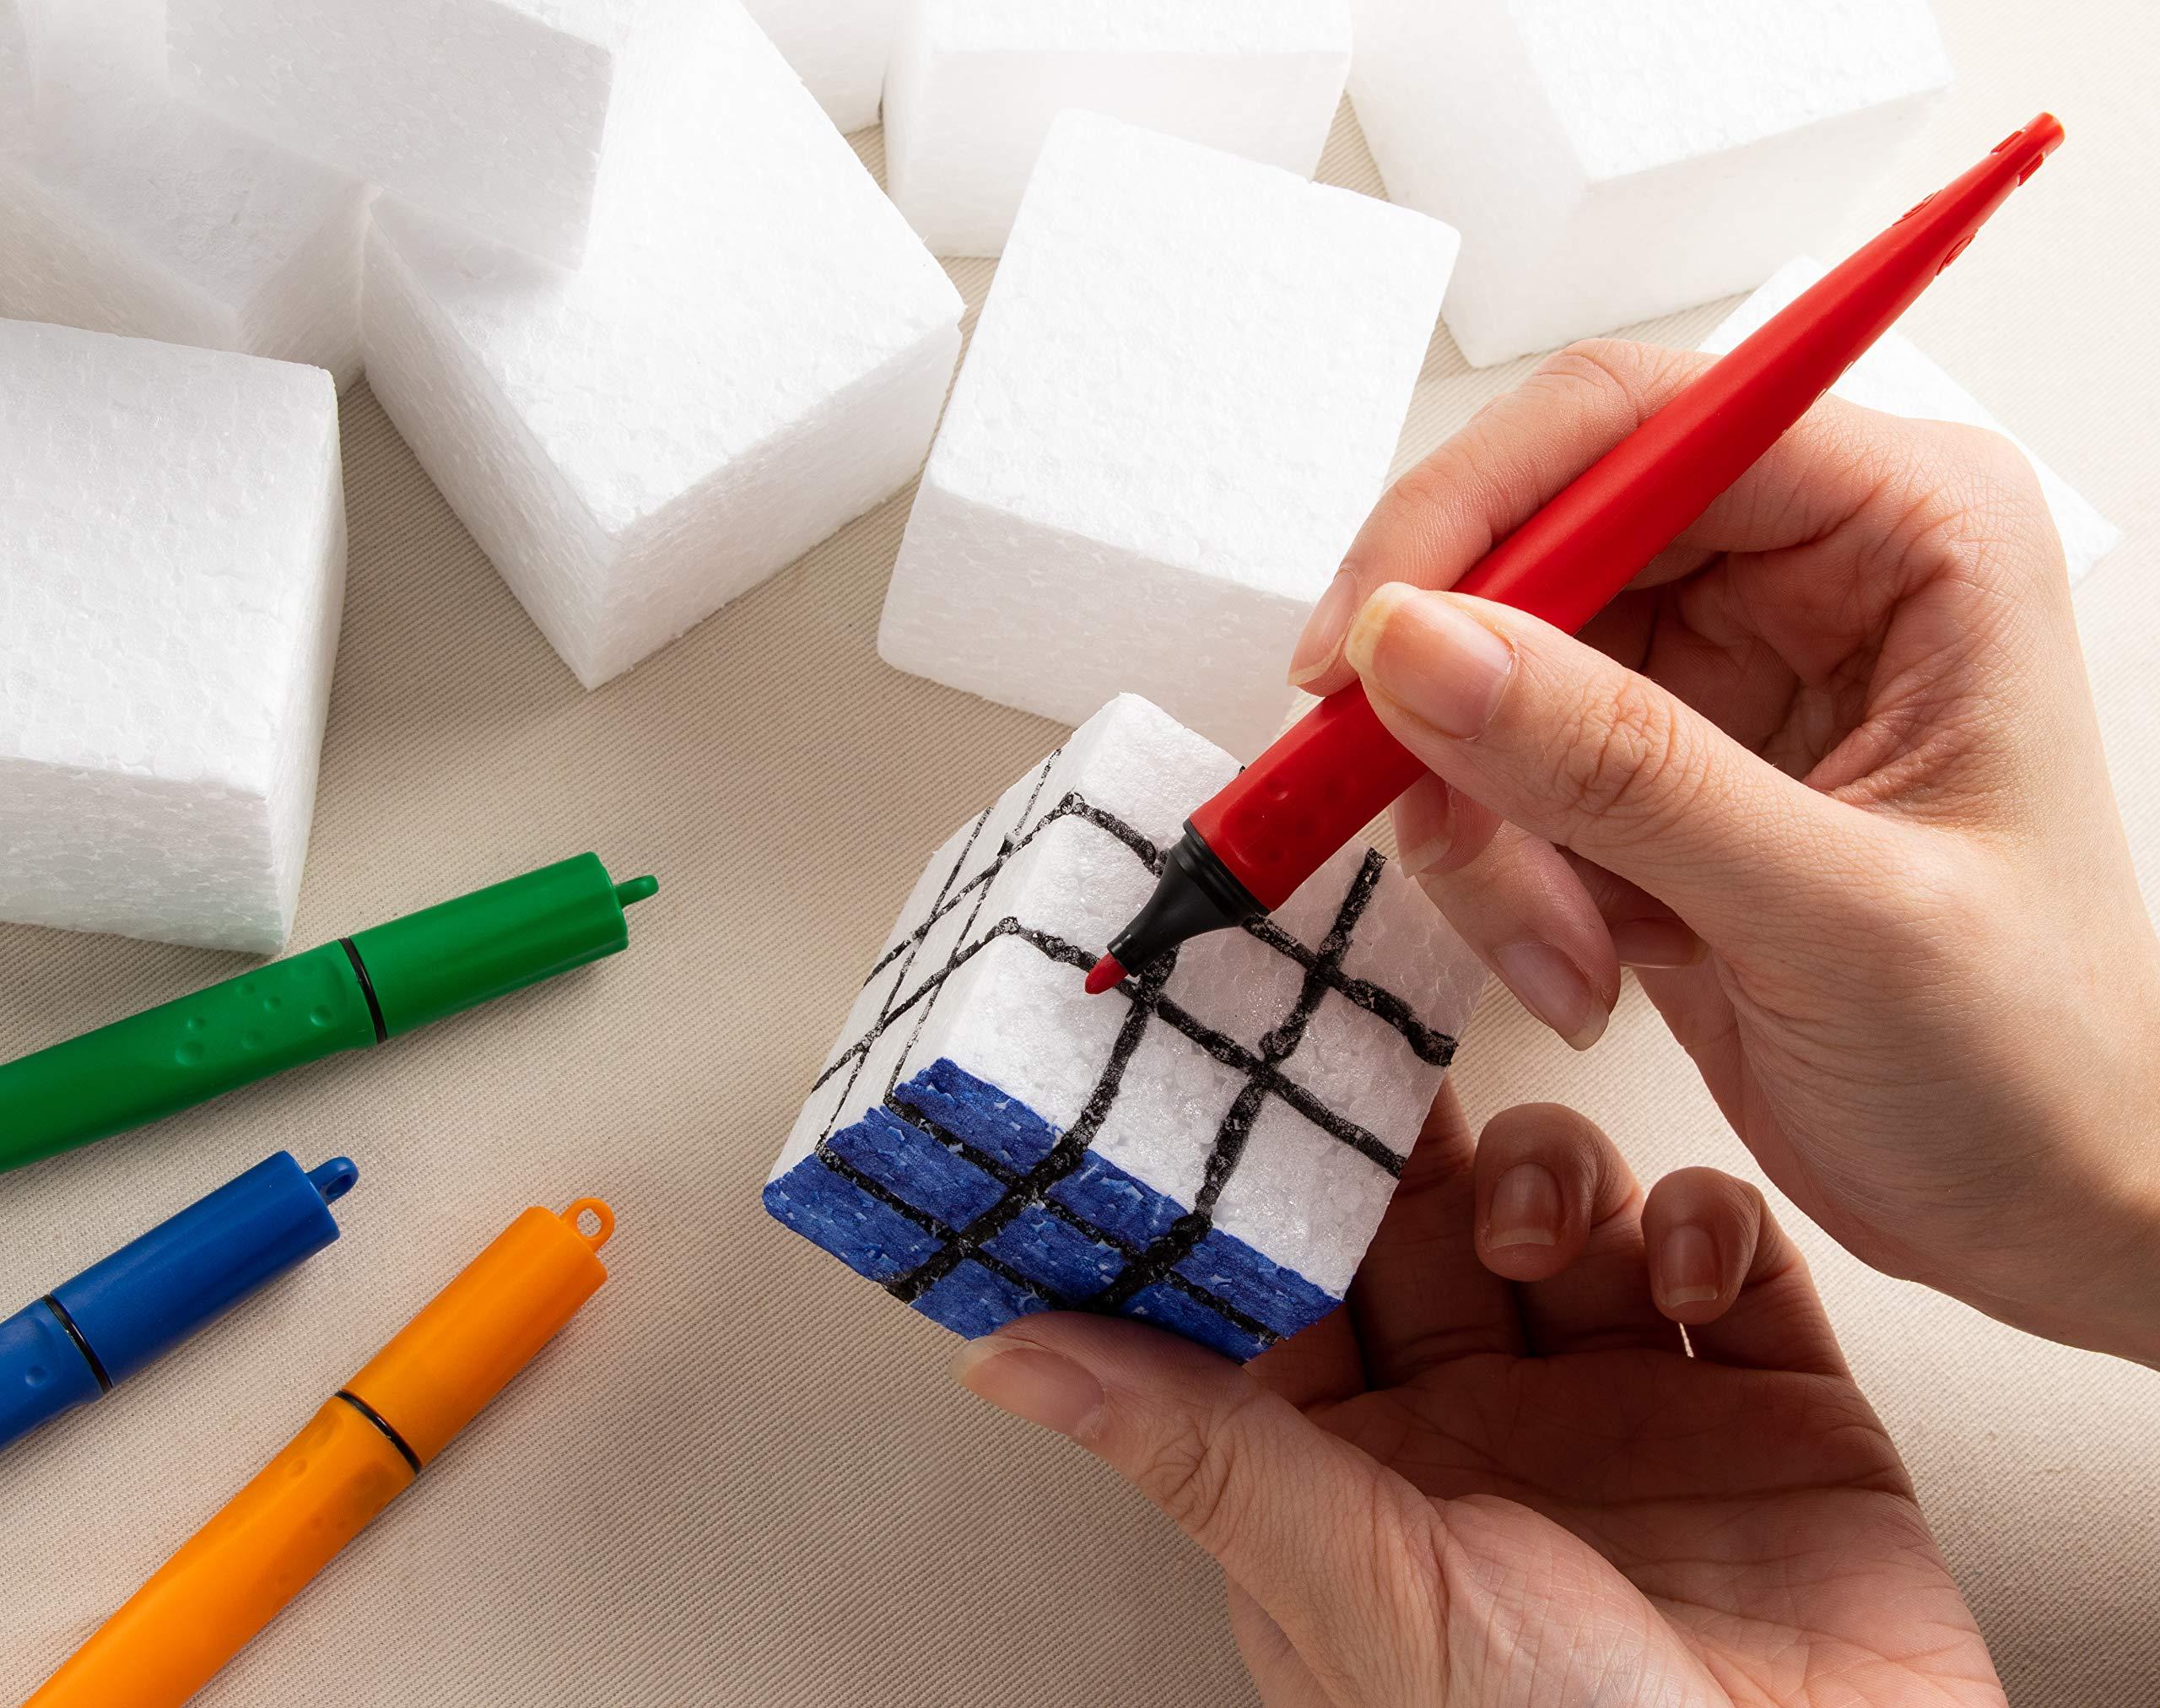 Craft Foam Blocks - 36-Piece Polystyrene Foam Blocks for Crafts and Modeling, 2 x 2 x 2 Inches Blank Craft Foam by Genie Crafts (Image #3)